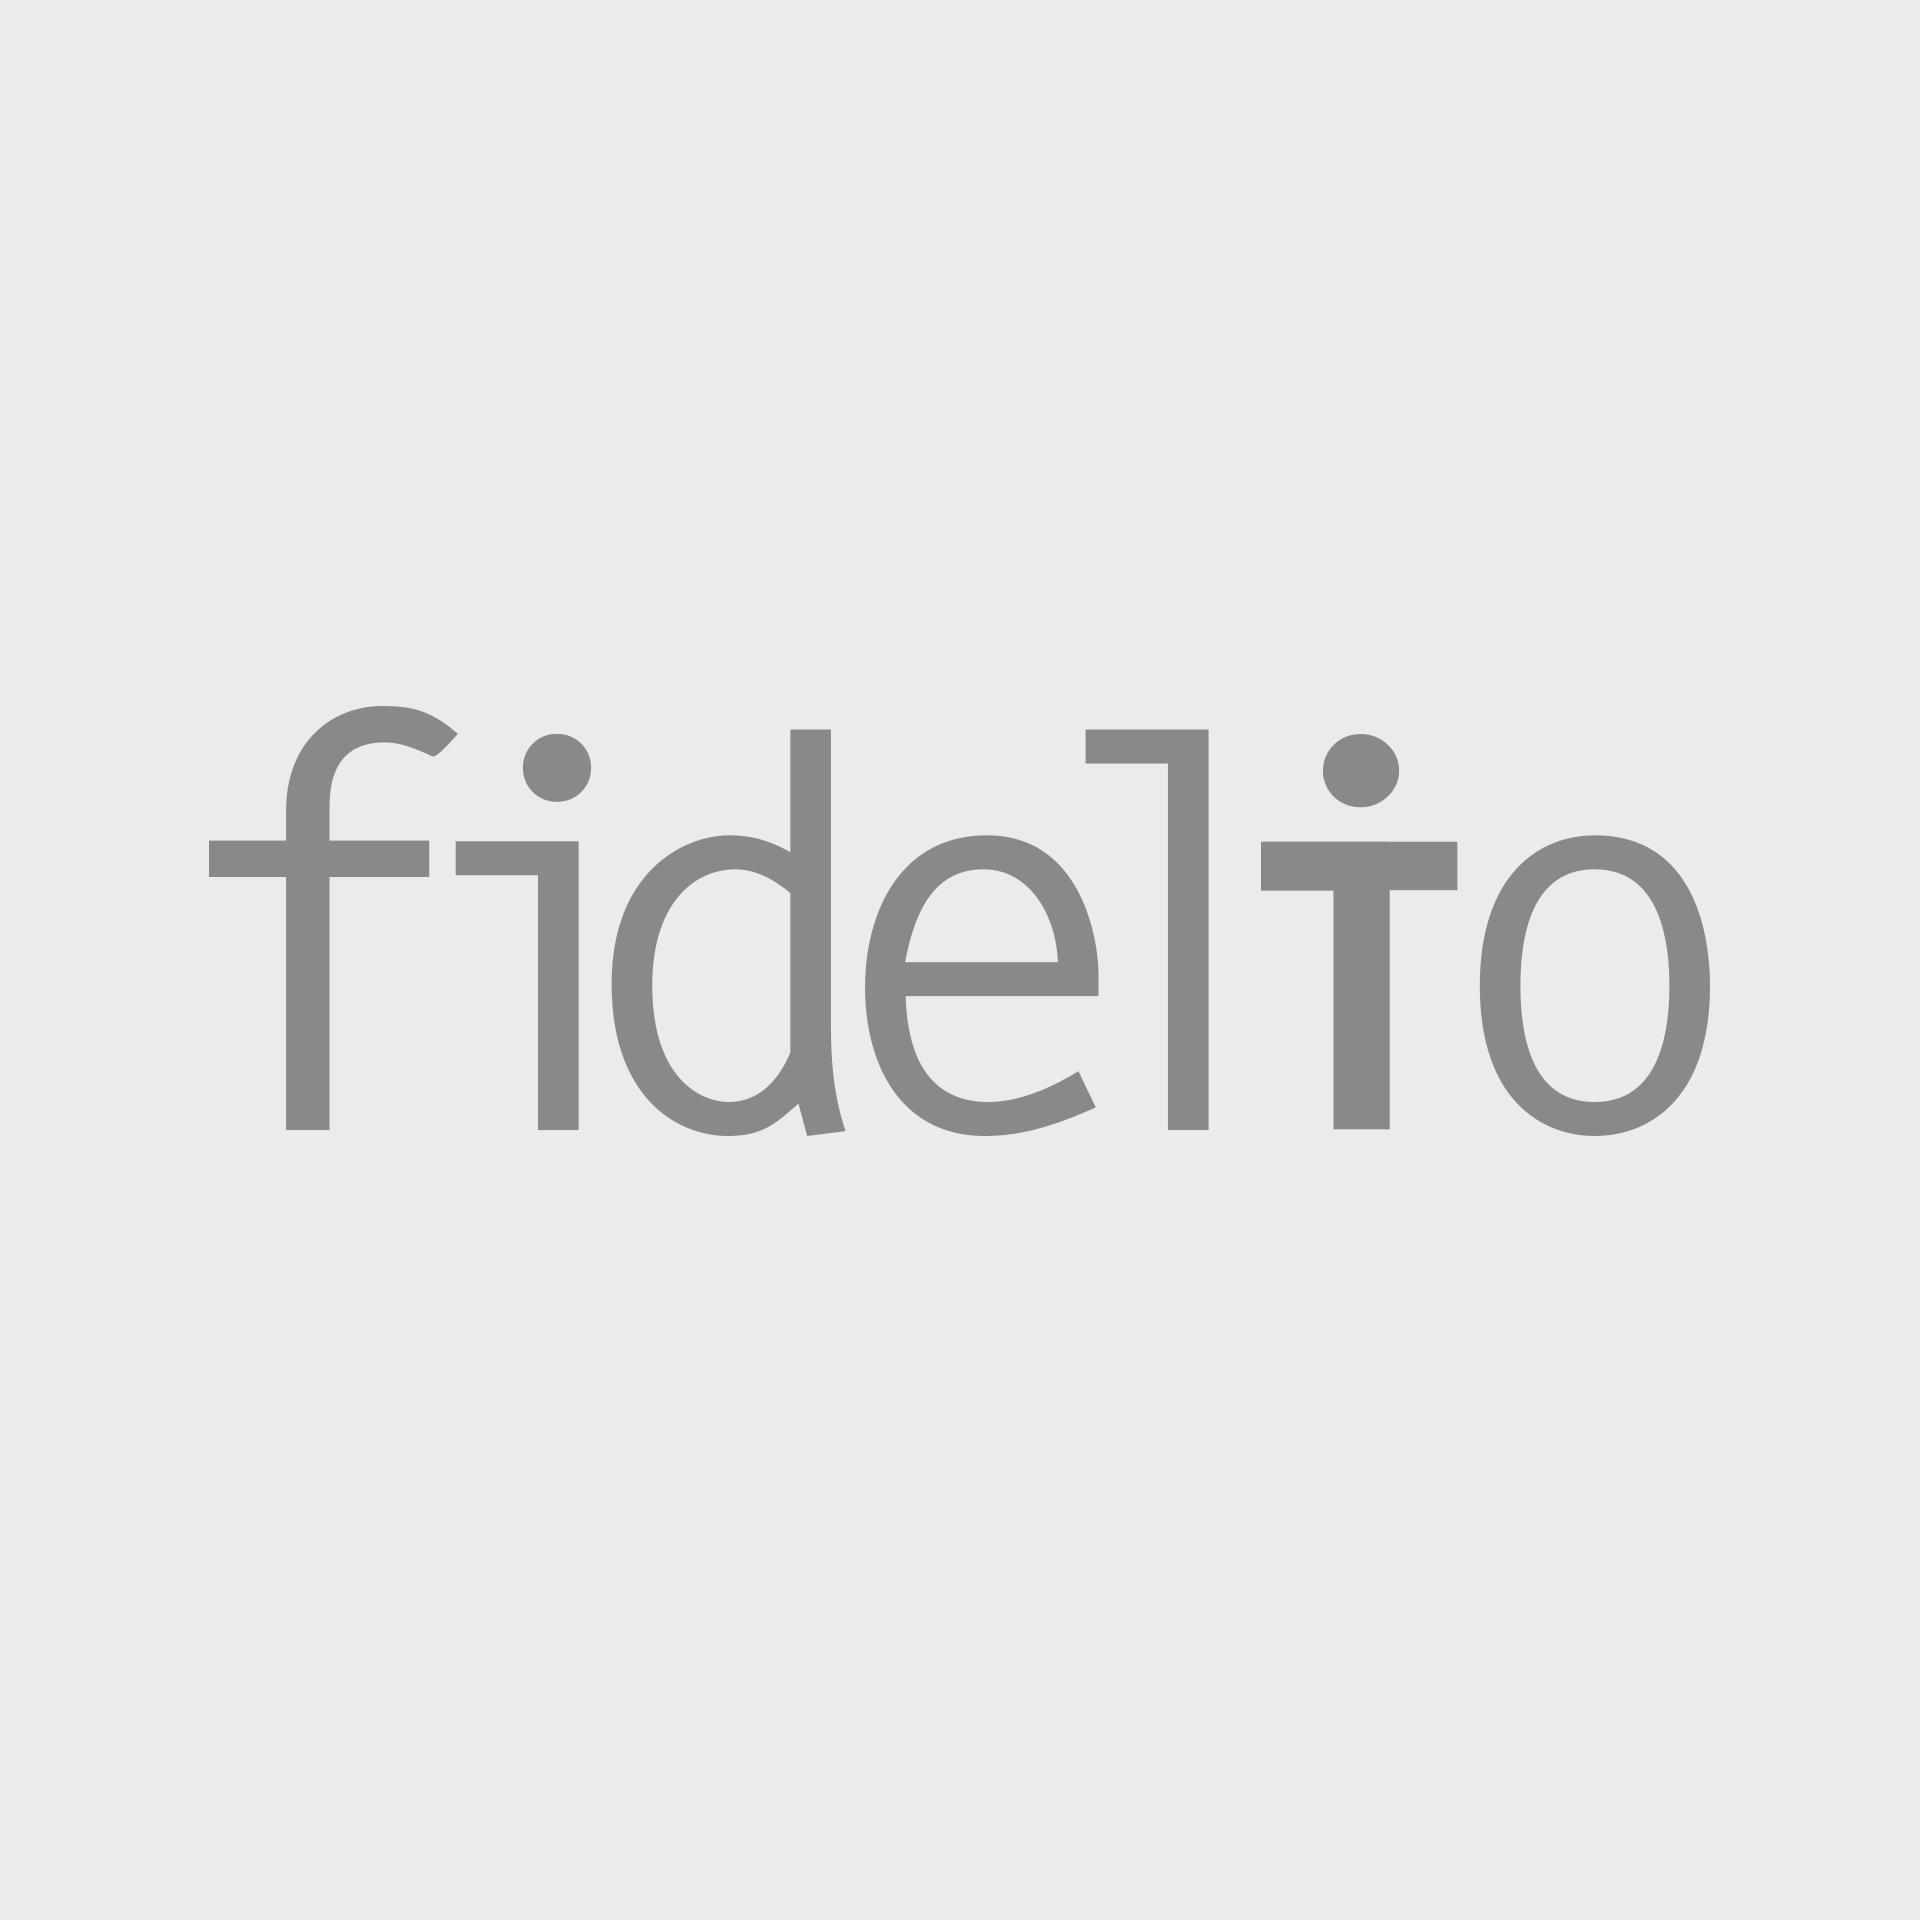 btf 2016 logo